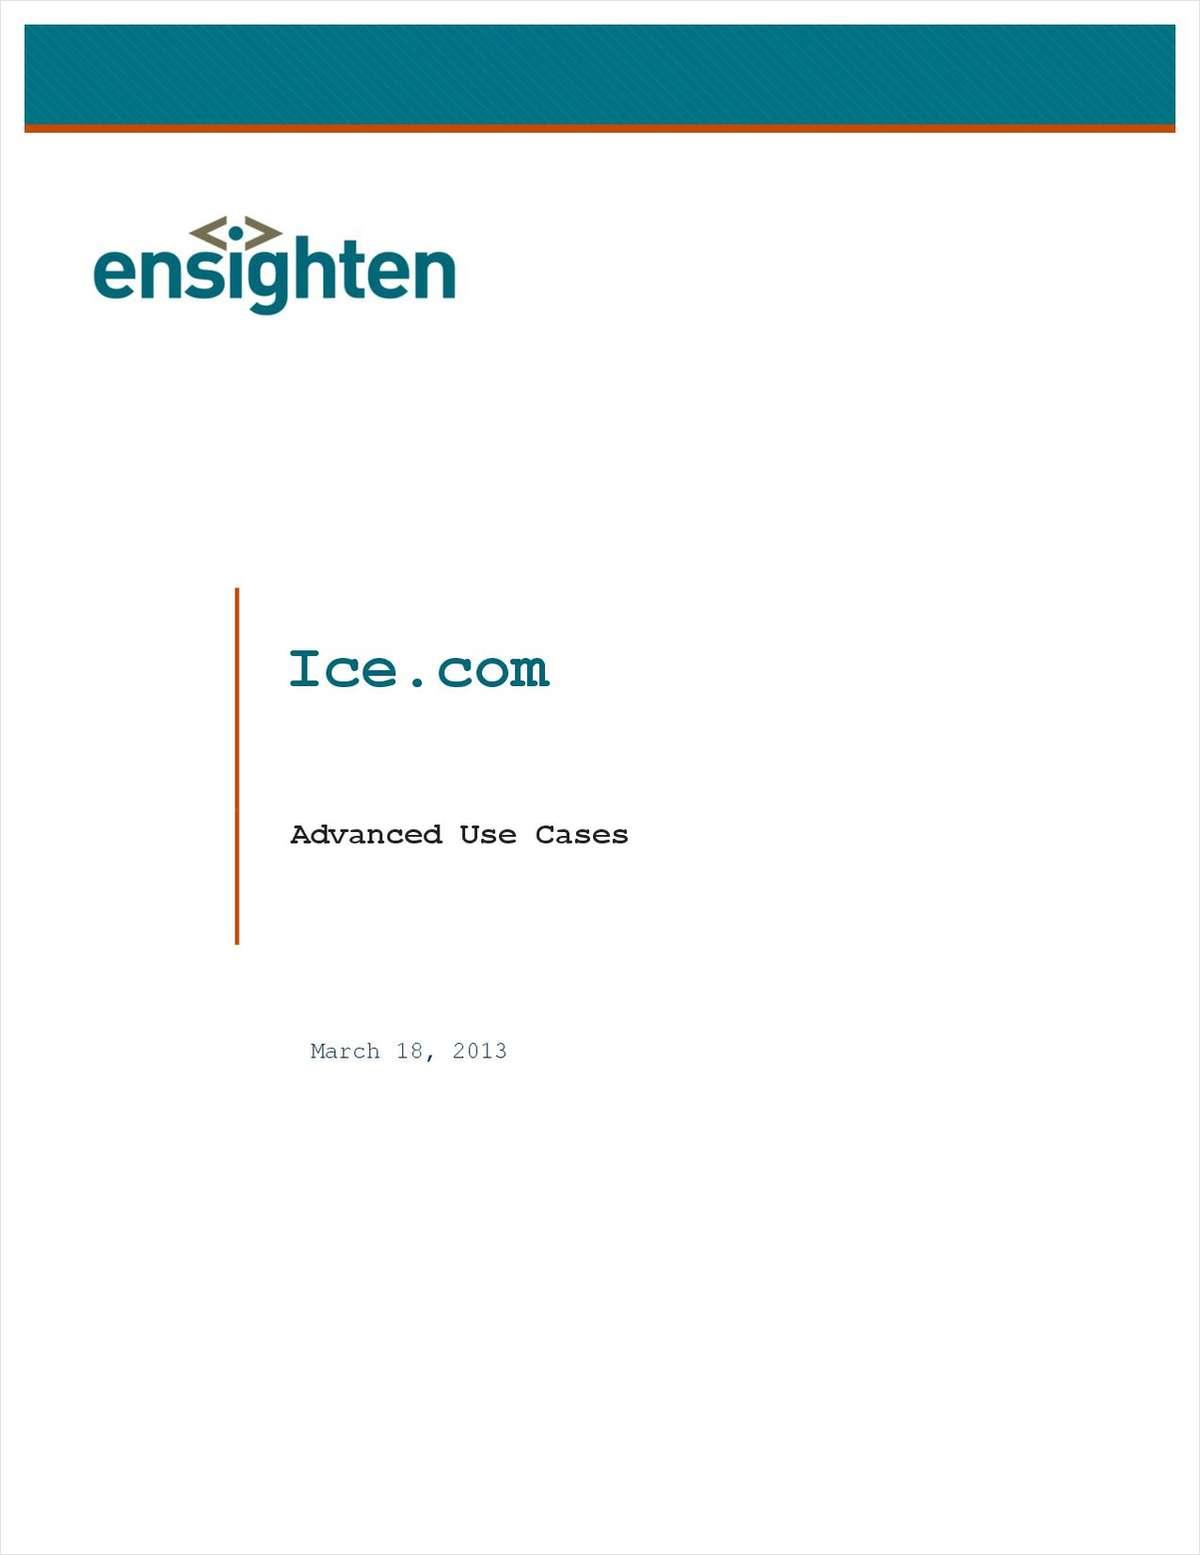 Advanced Use Case: Ice.com